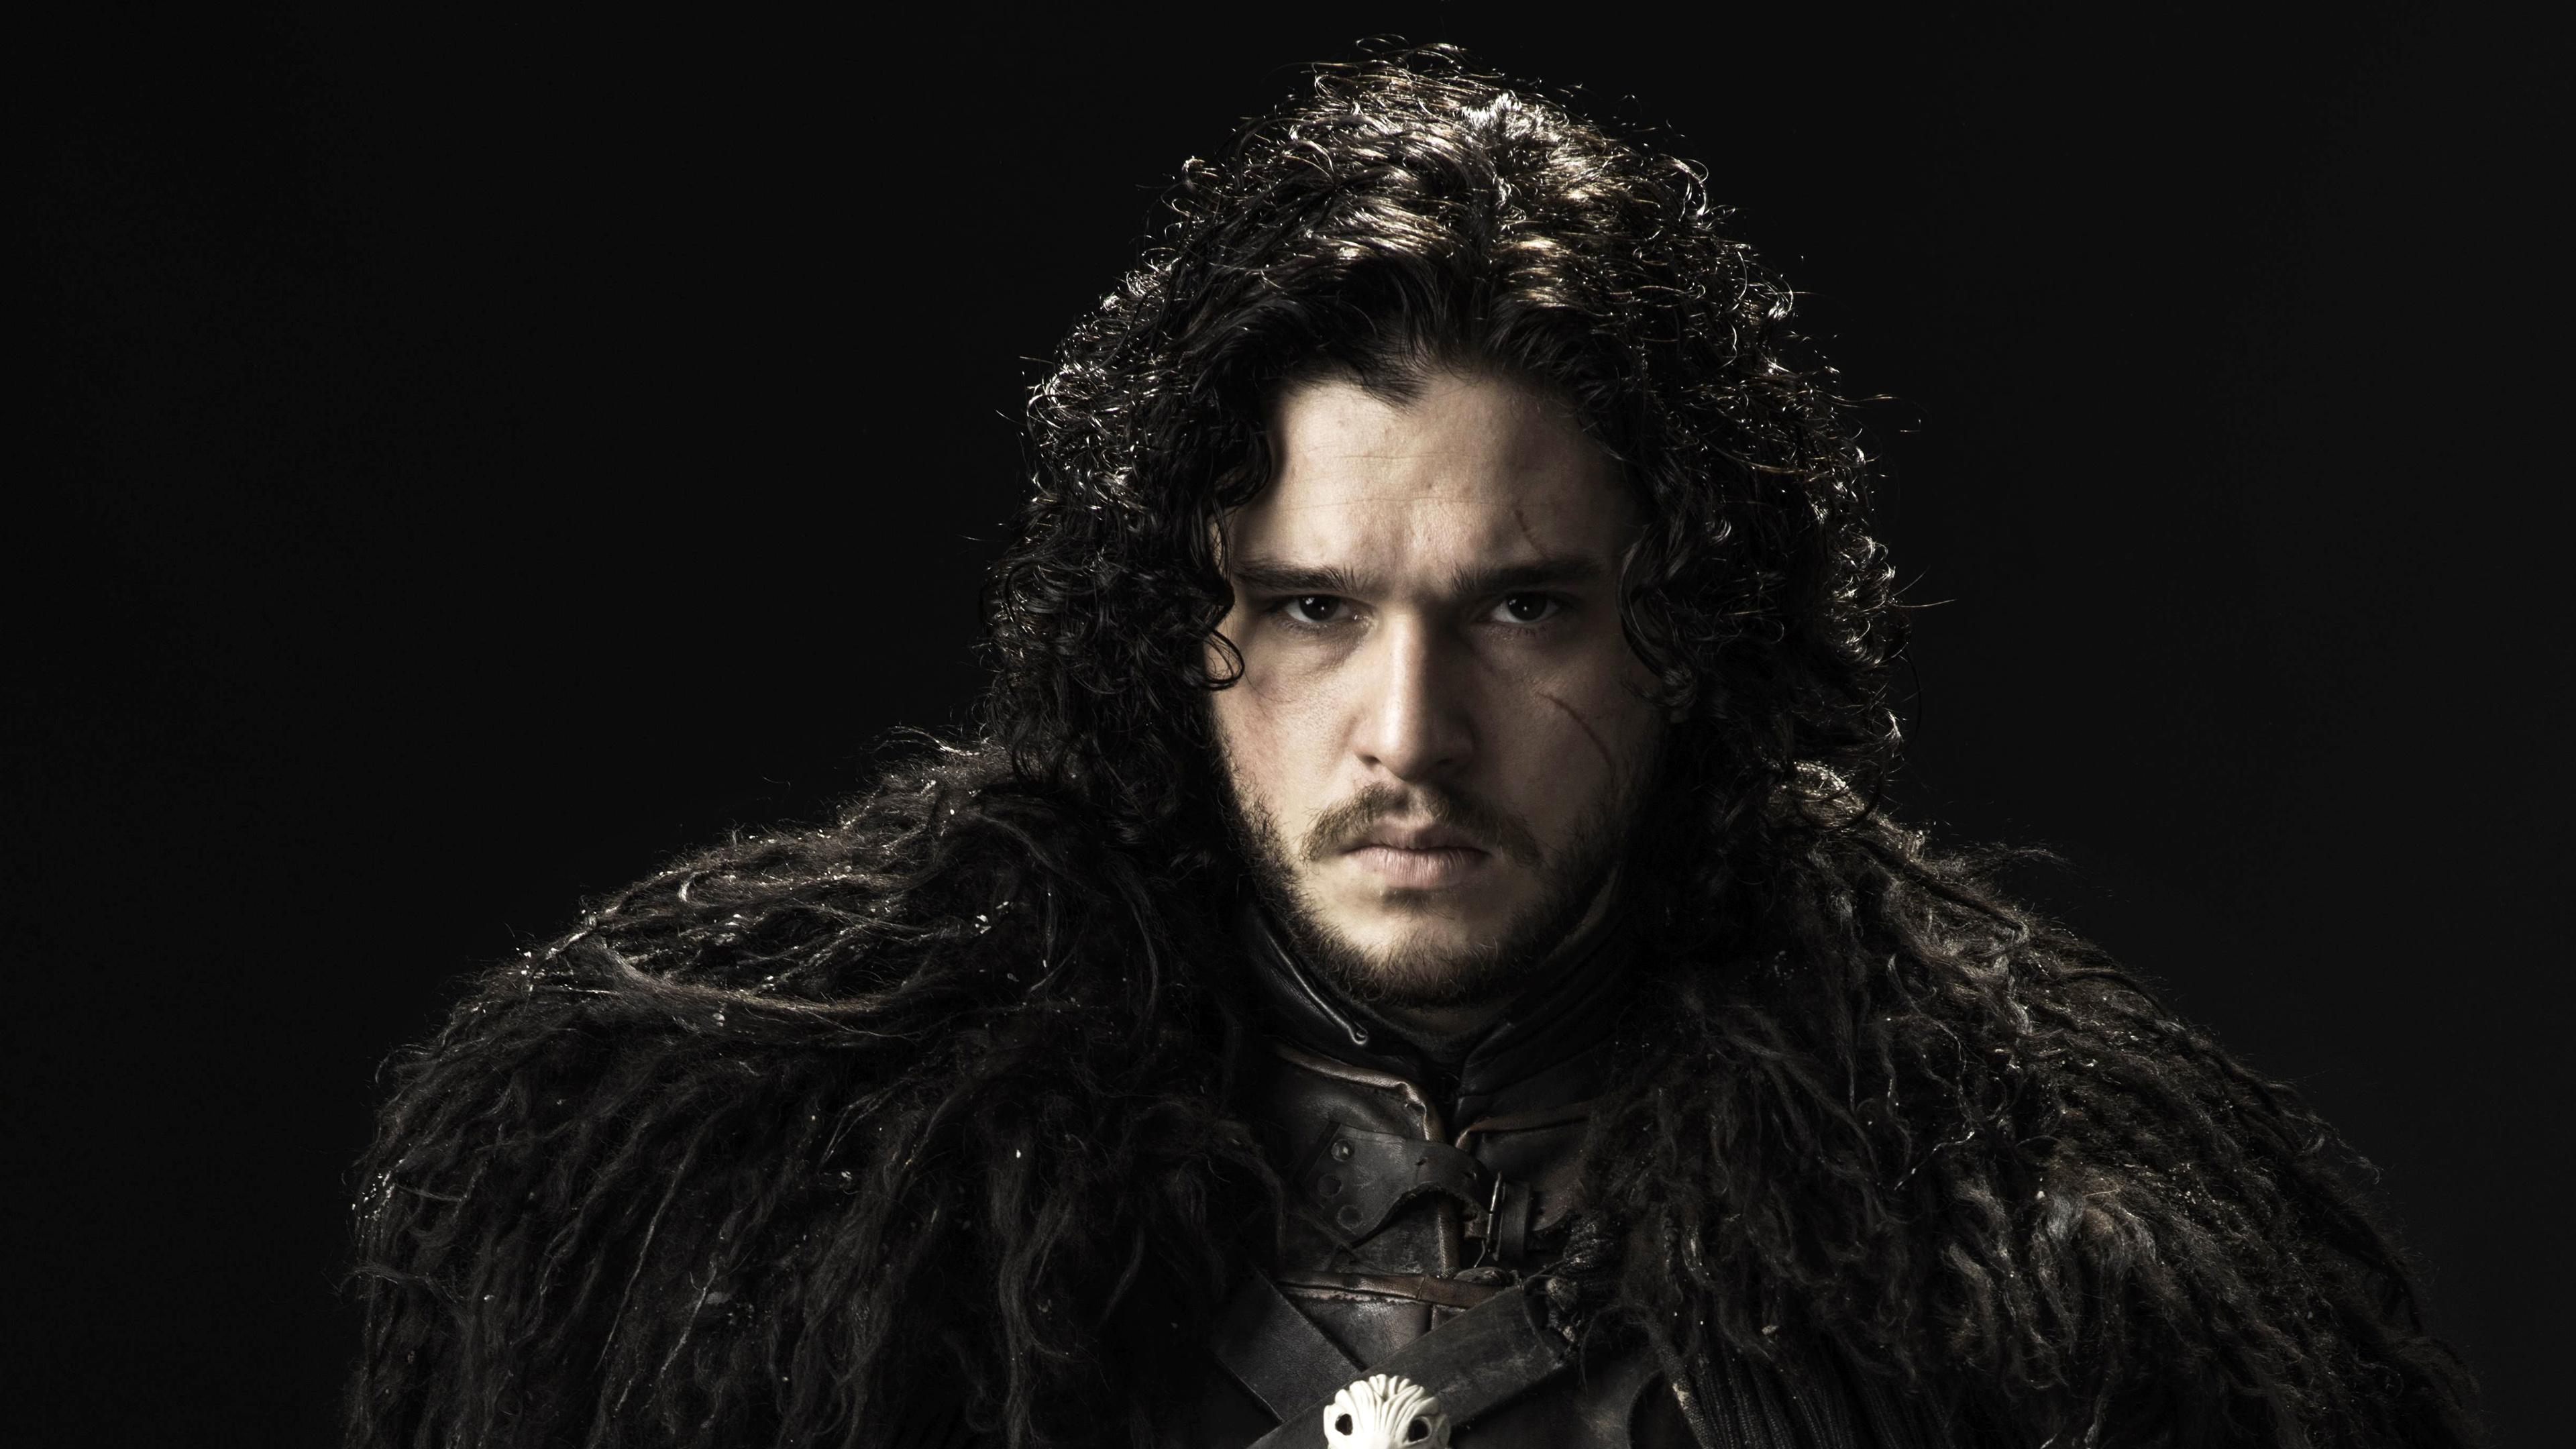 4k Game Of Thrones Wallpaper: Kit Harington Jon Snow Game Of Thrones 4K Wallpaper